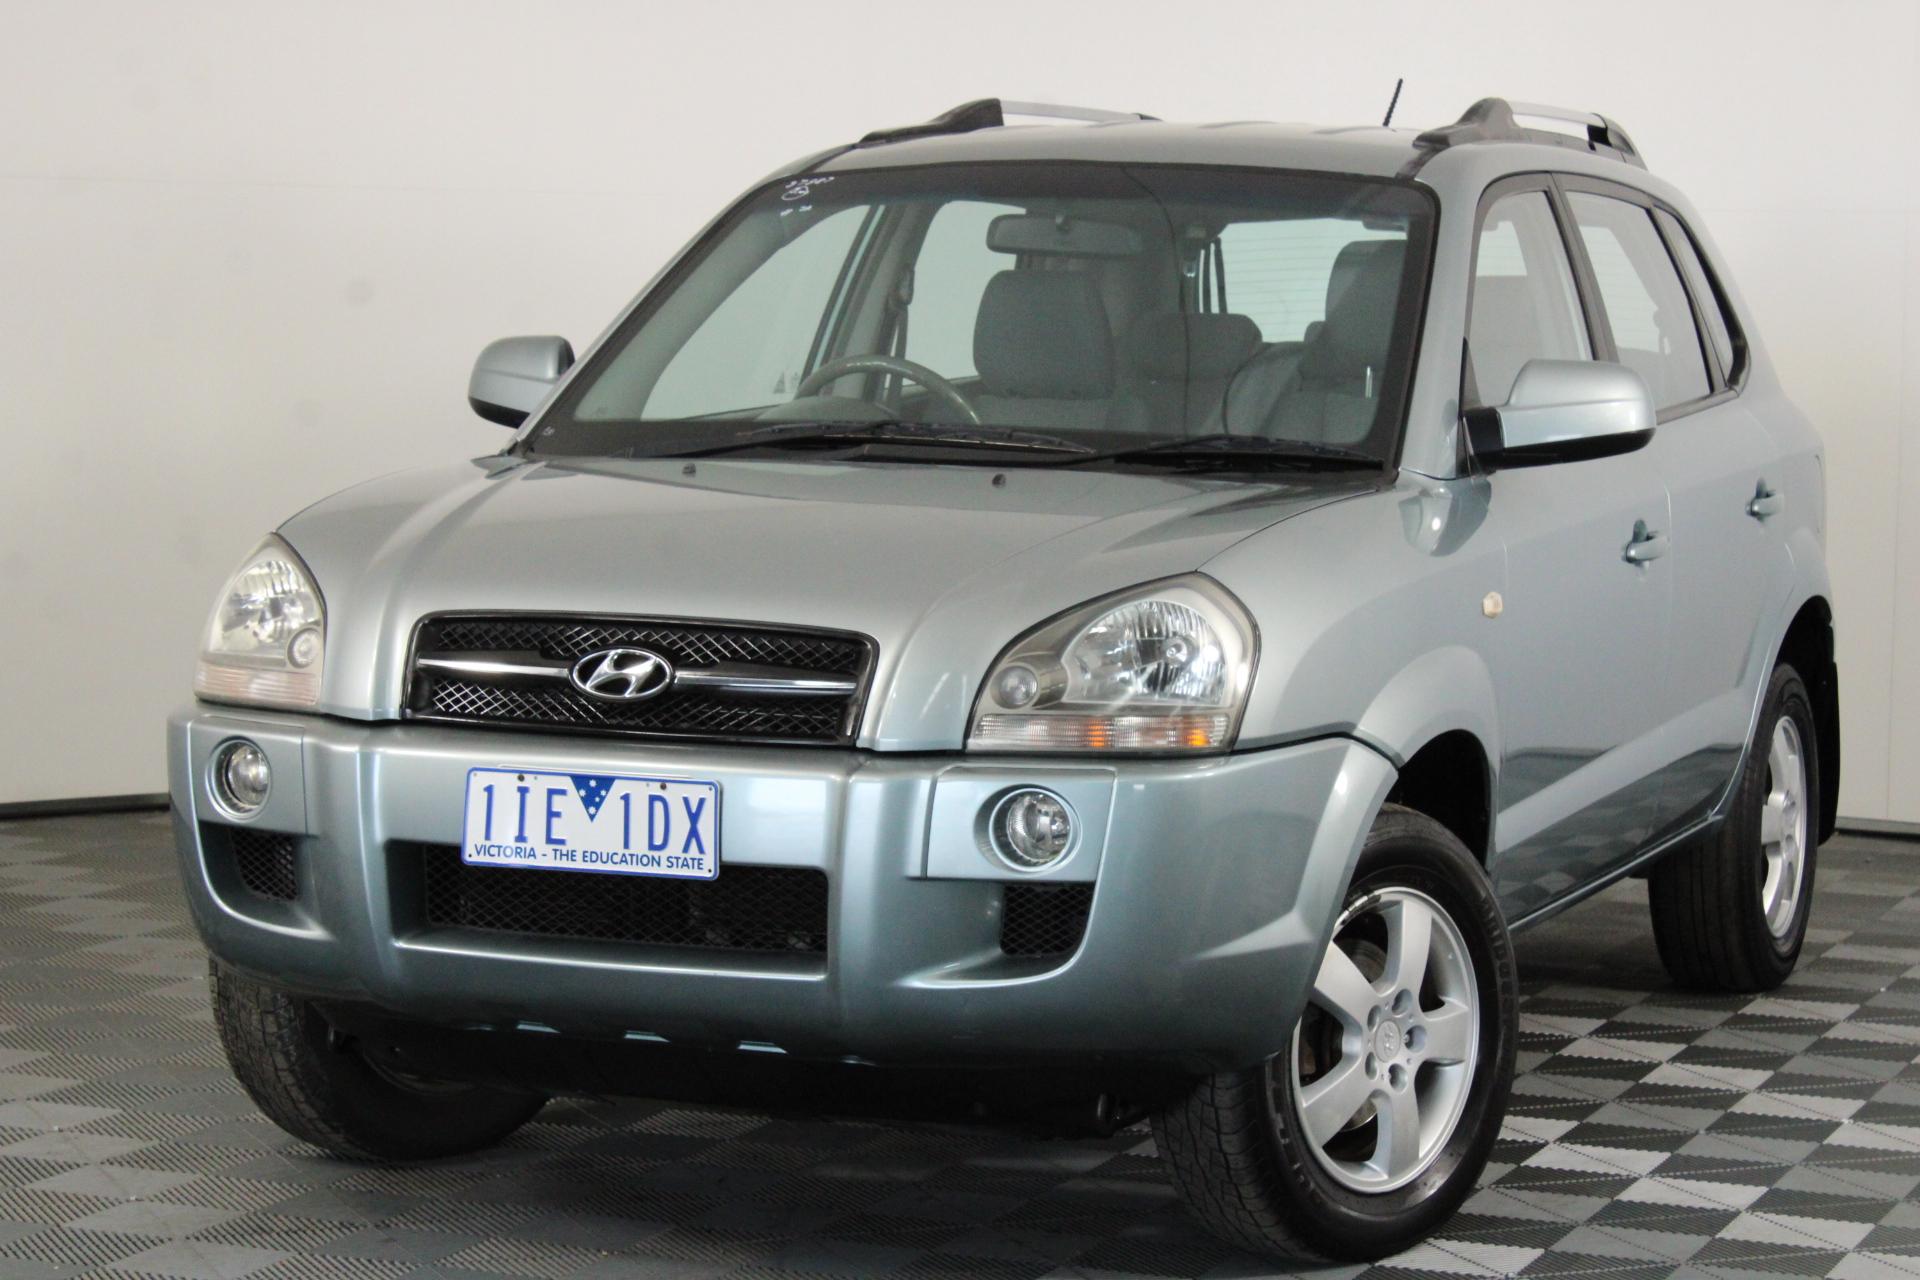 2006 Hyundai Tucson City Automatic Wagon